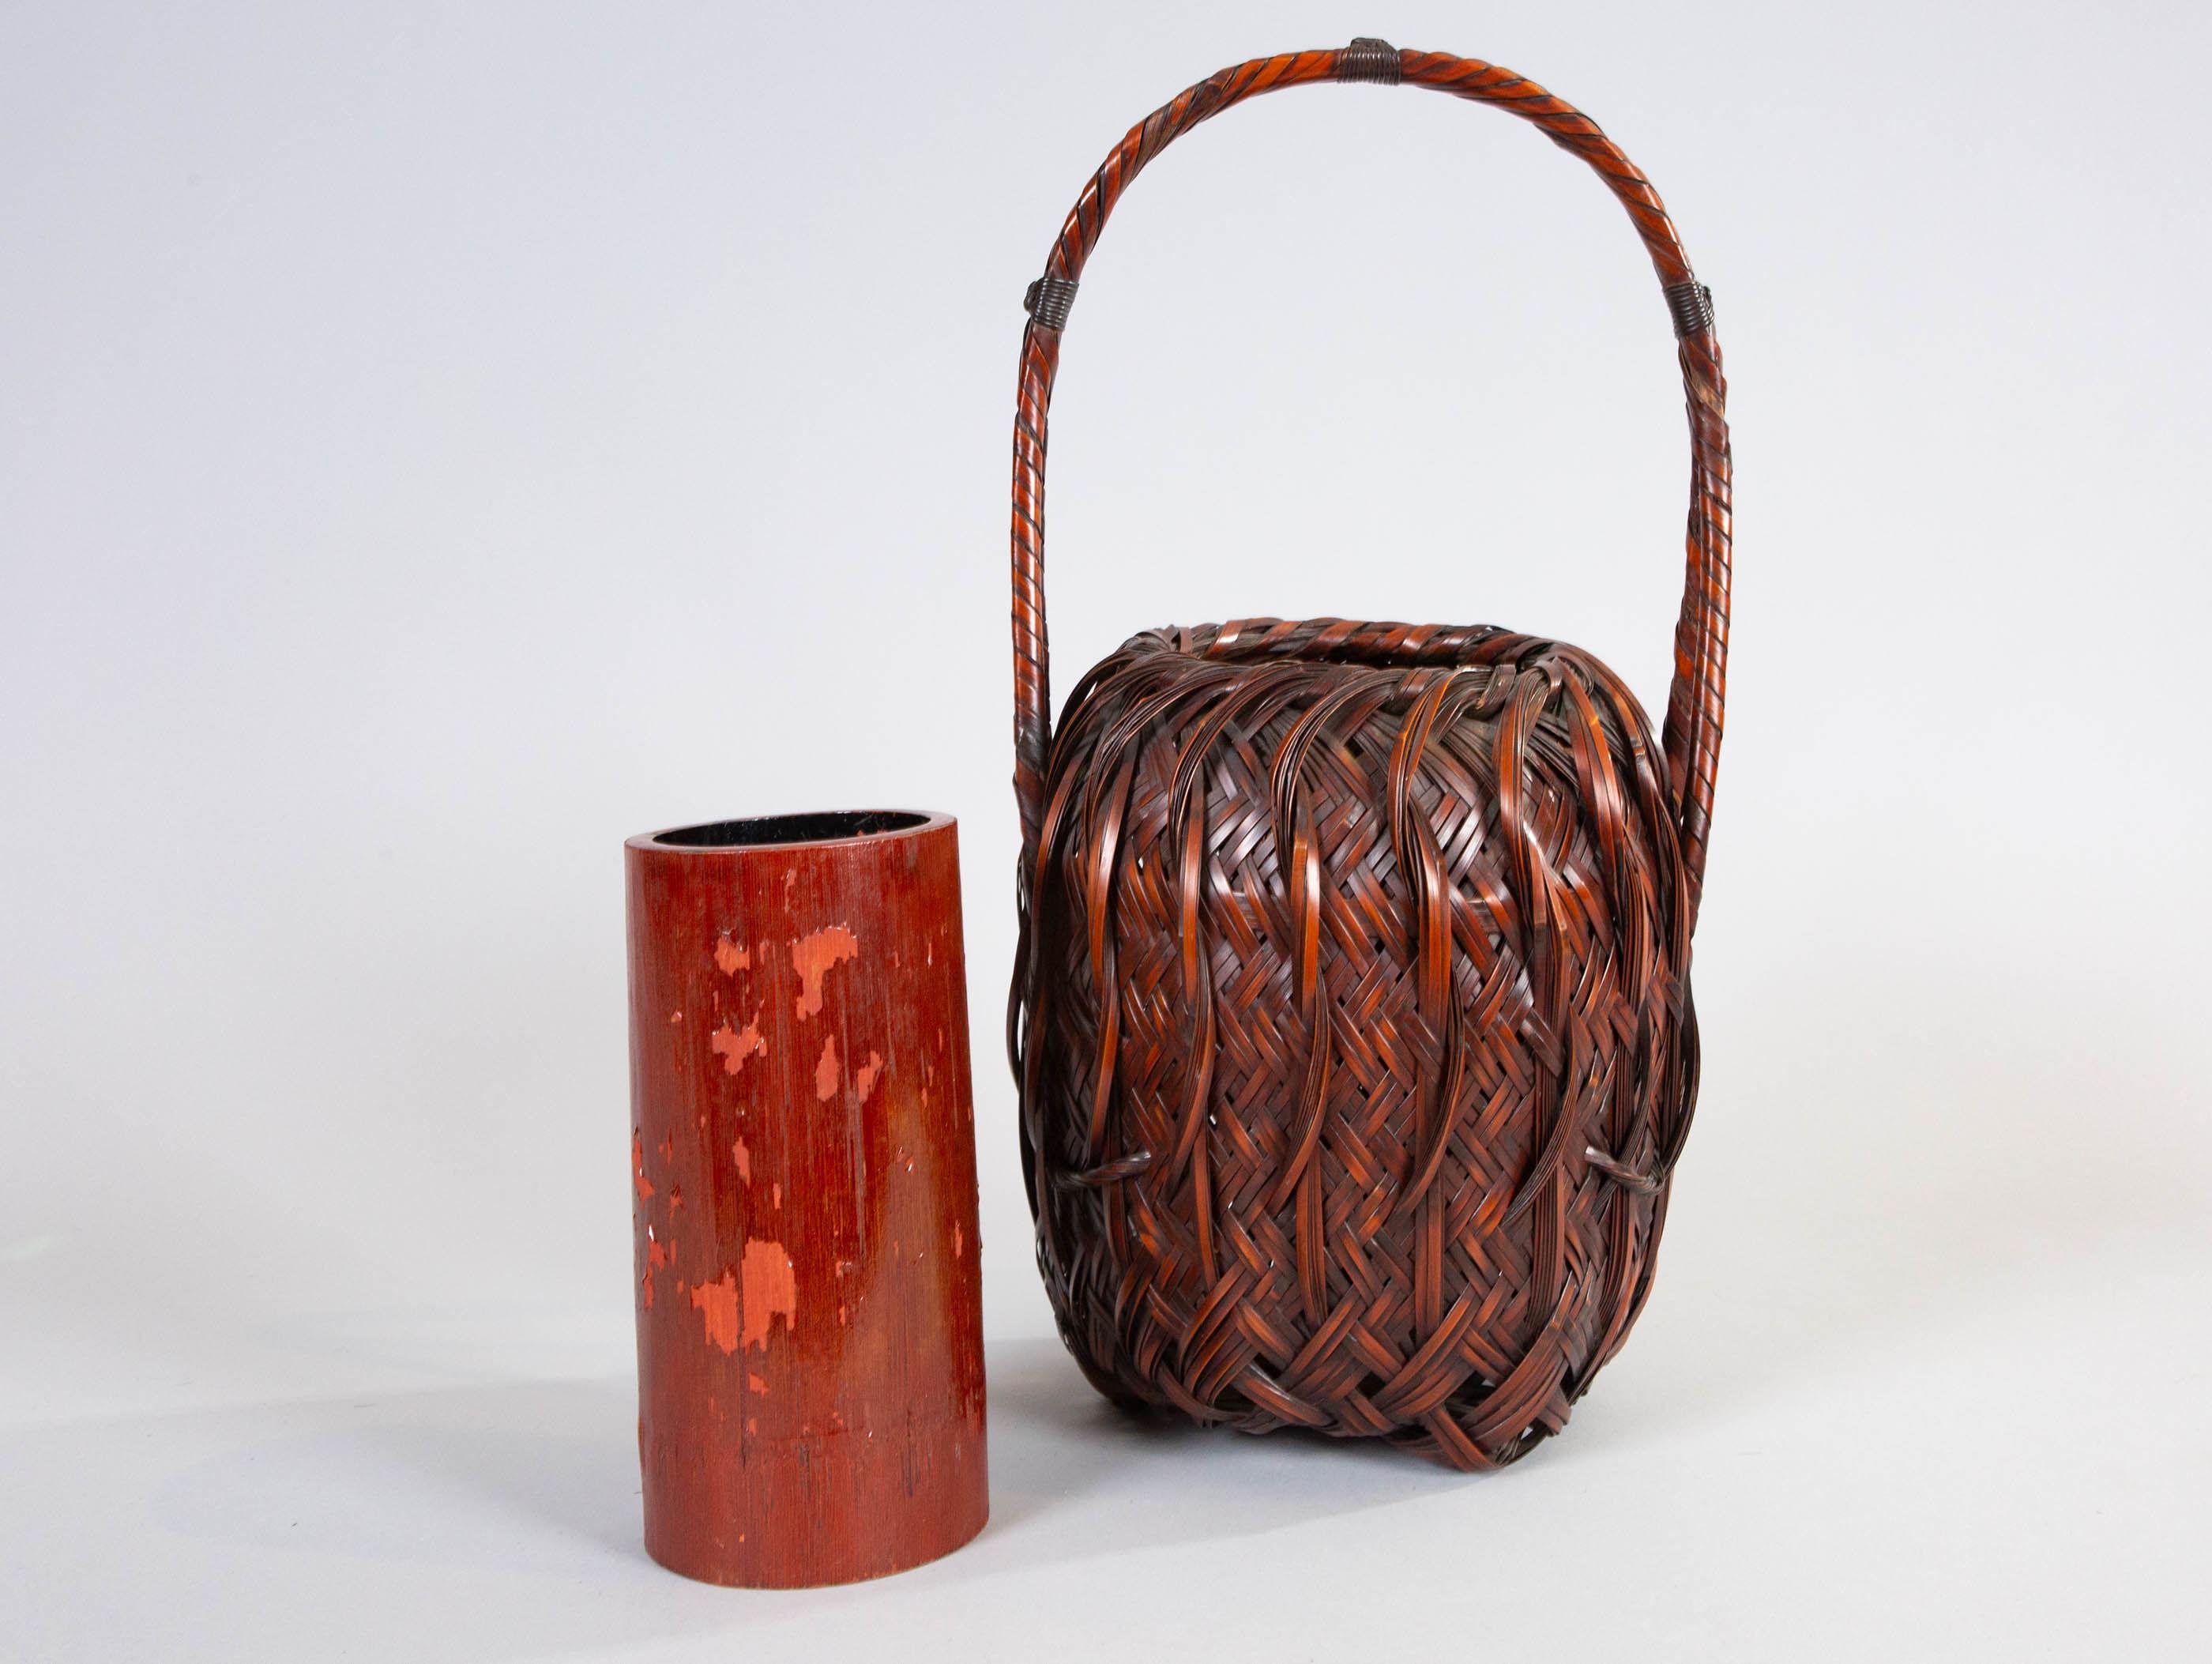 Japanese Flower Arranging Basket (Ikebana)